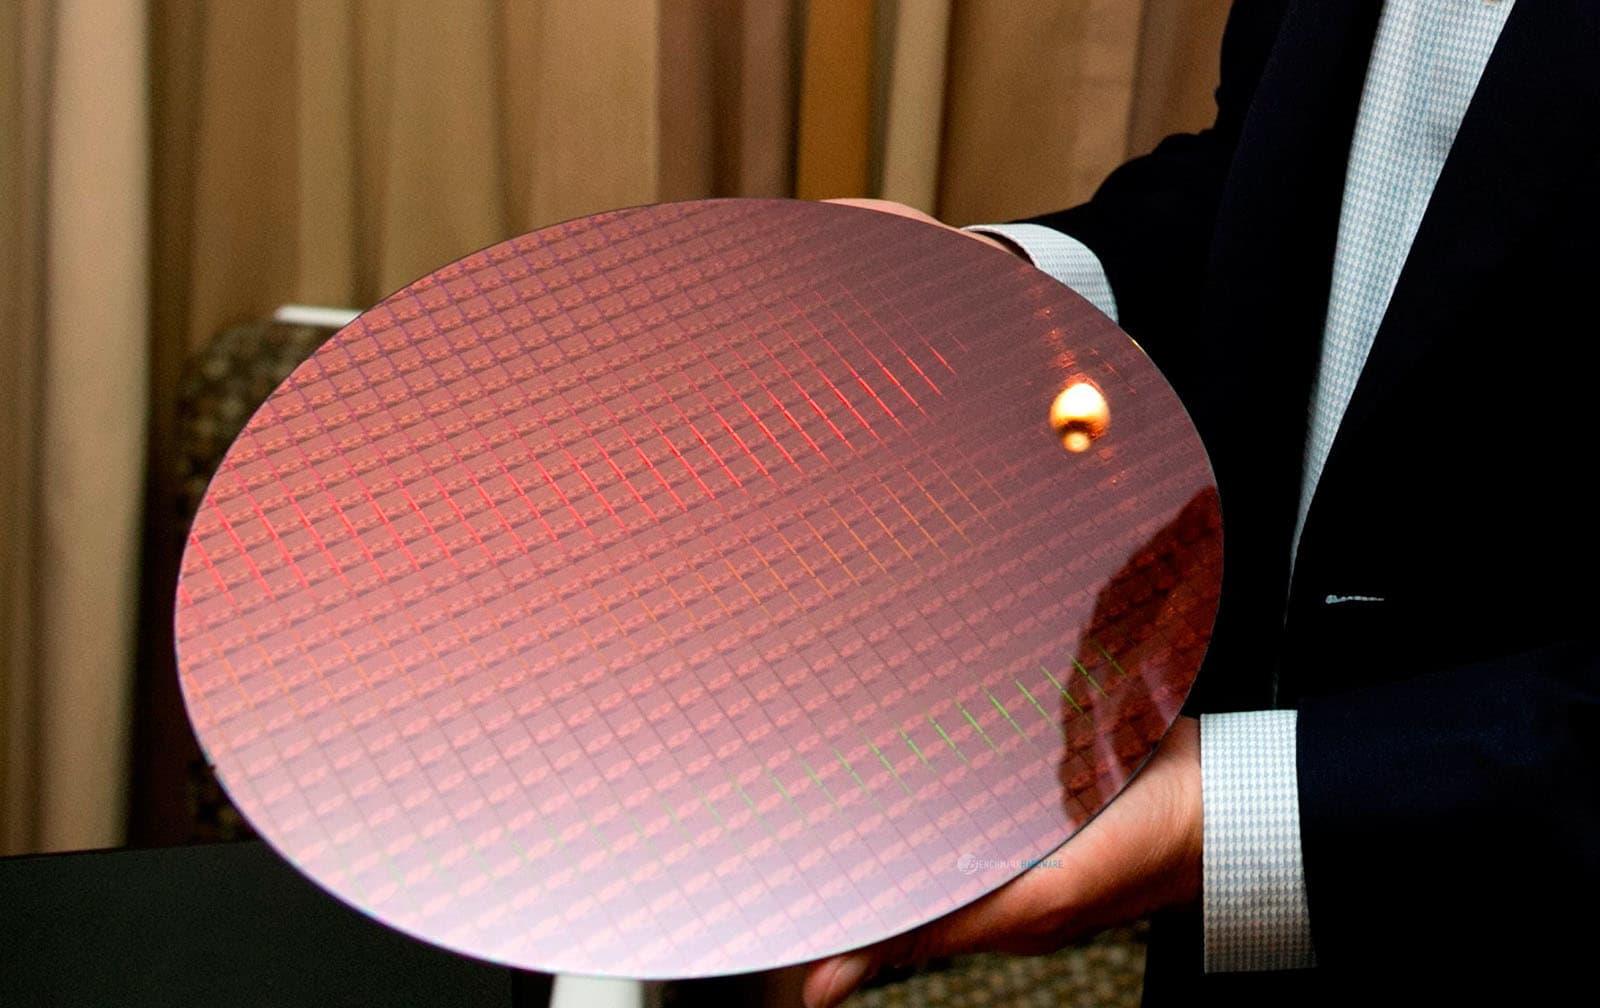 Intel delays its 10-nanometer 'Cannon Lake' CPUs yet again